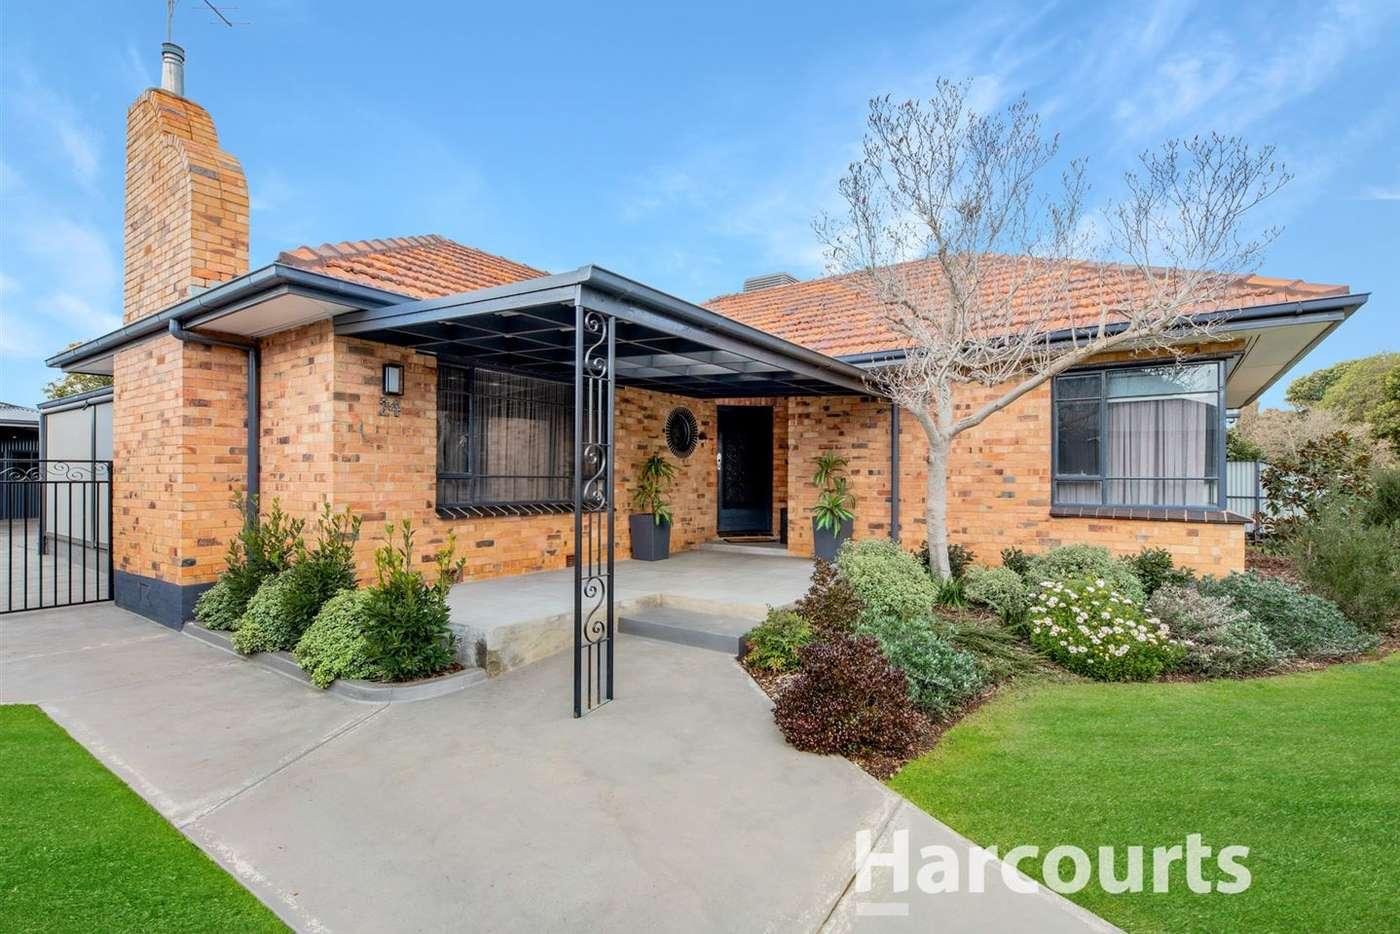 Main view of Homely house listing, 24 Steane Street, Wangaratta VIC 3677